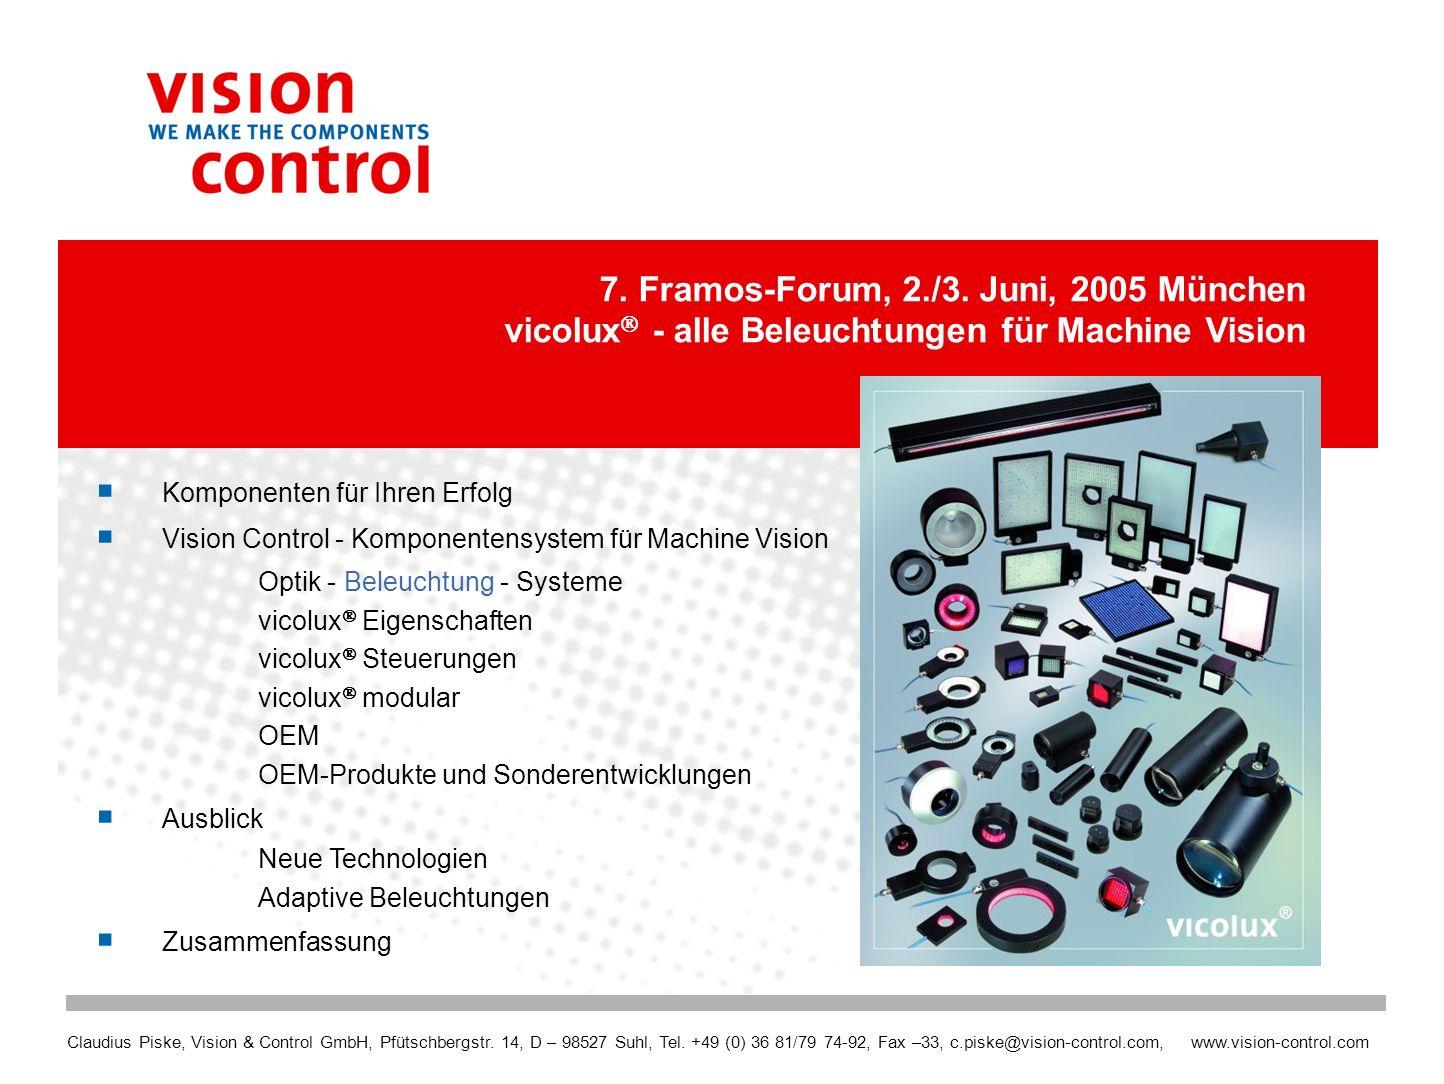 7. Framos-Forum, 2./3. Juni, 2005 München